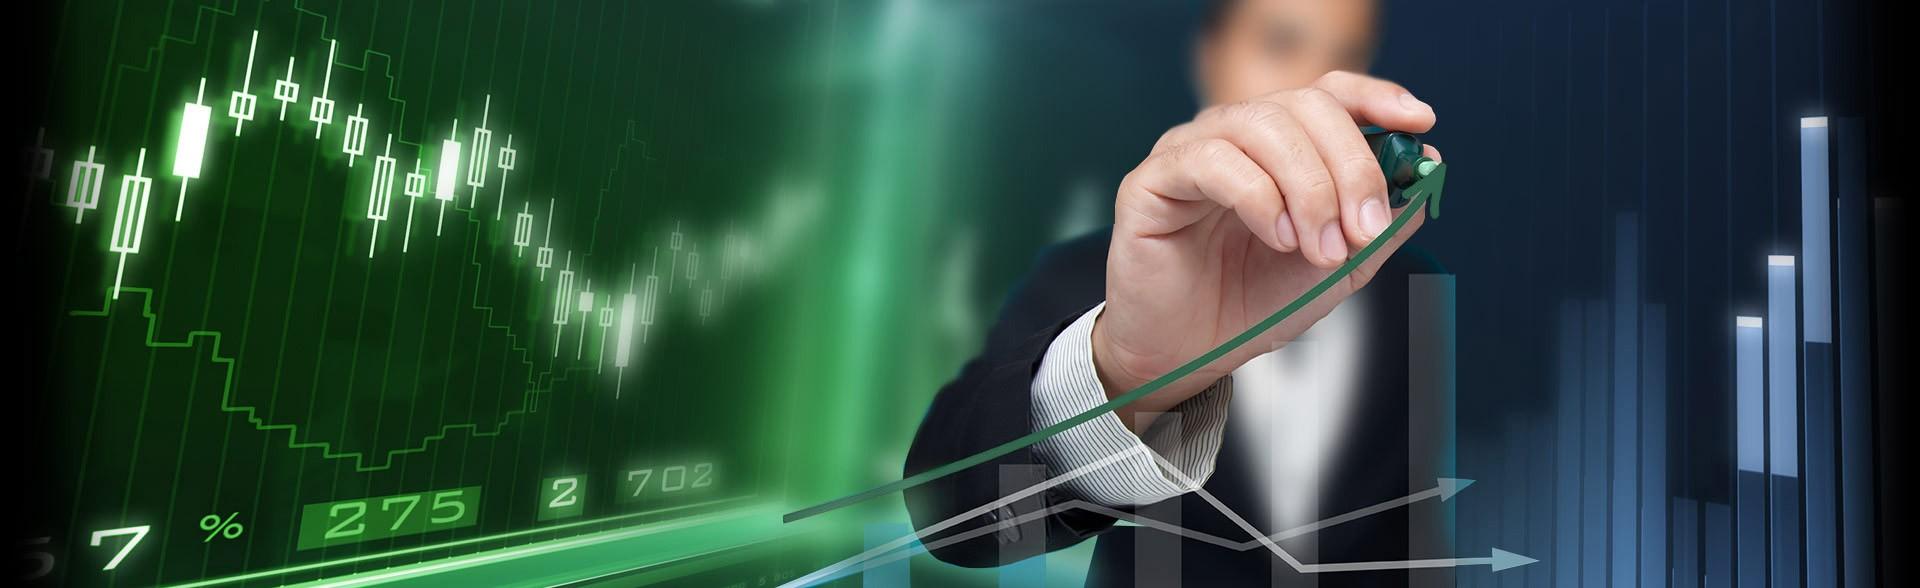 margine-variabile-trading